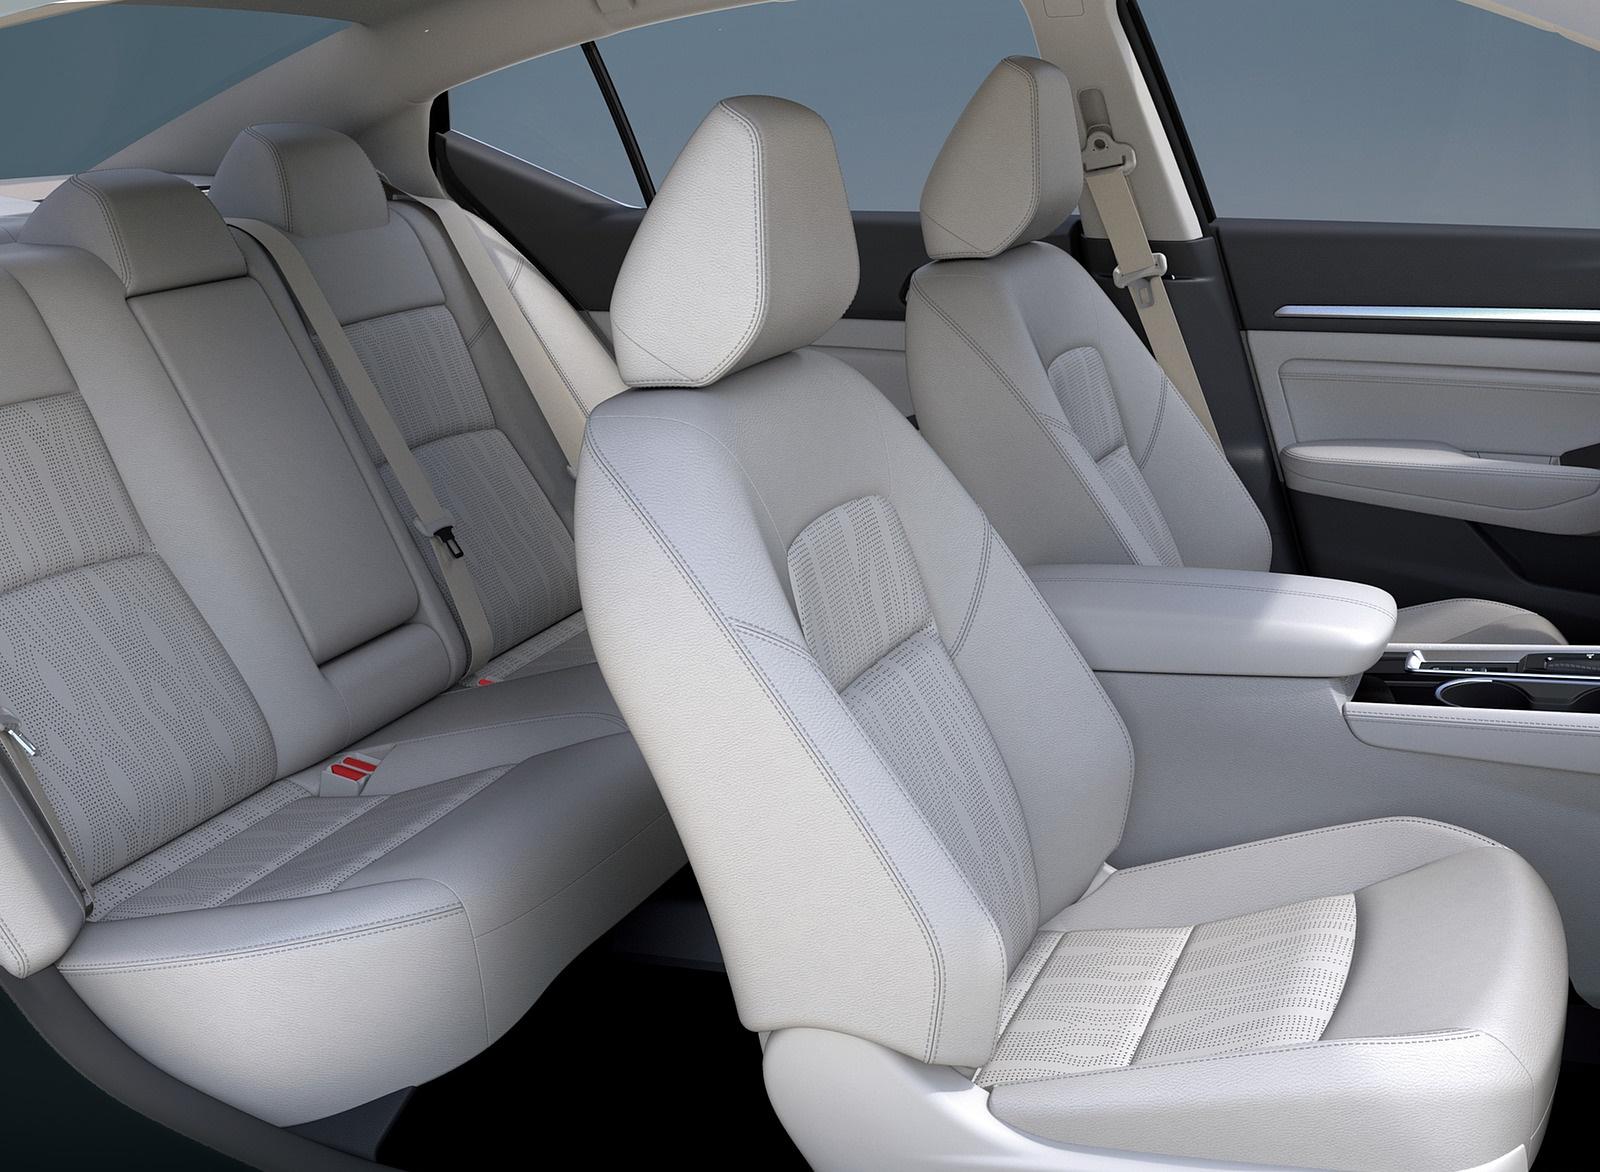 2019 Nissan Altima Interior Front Seats Wallpaper (14)